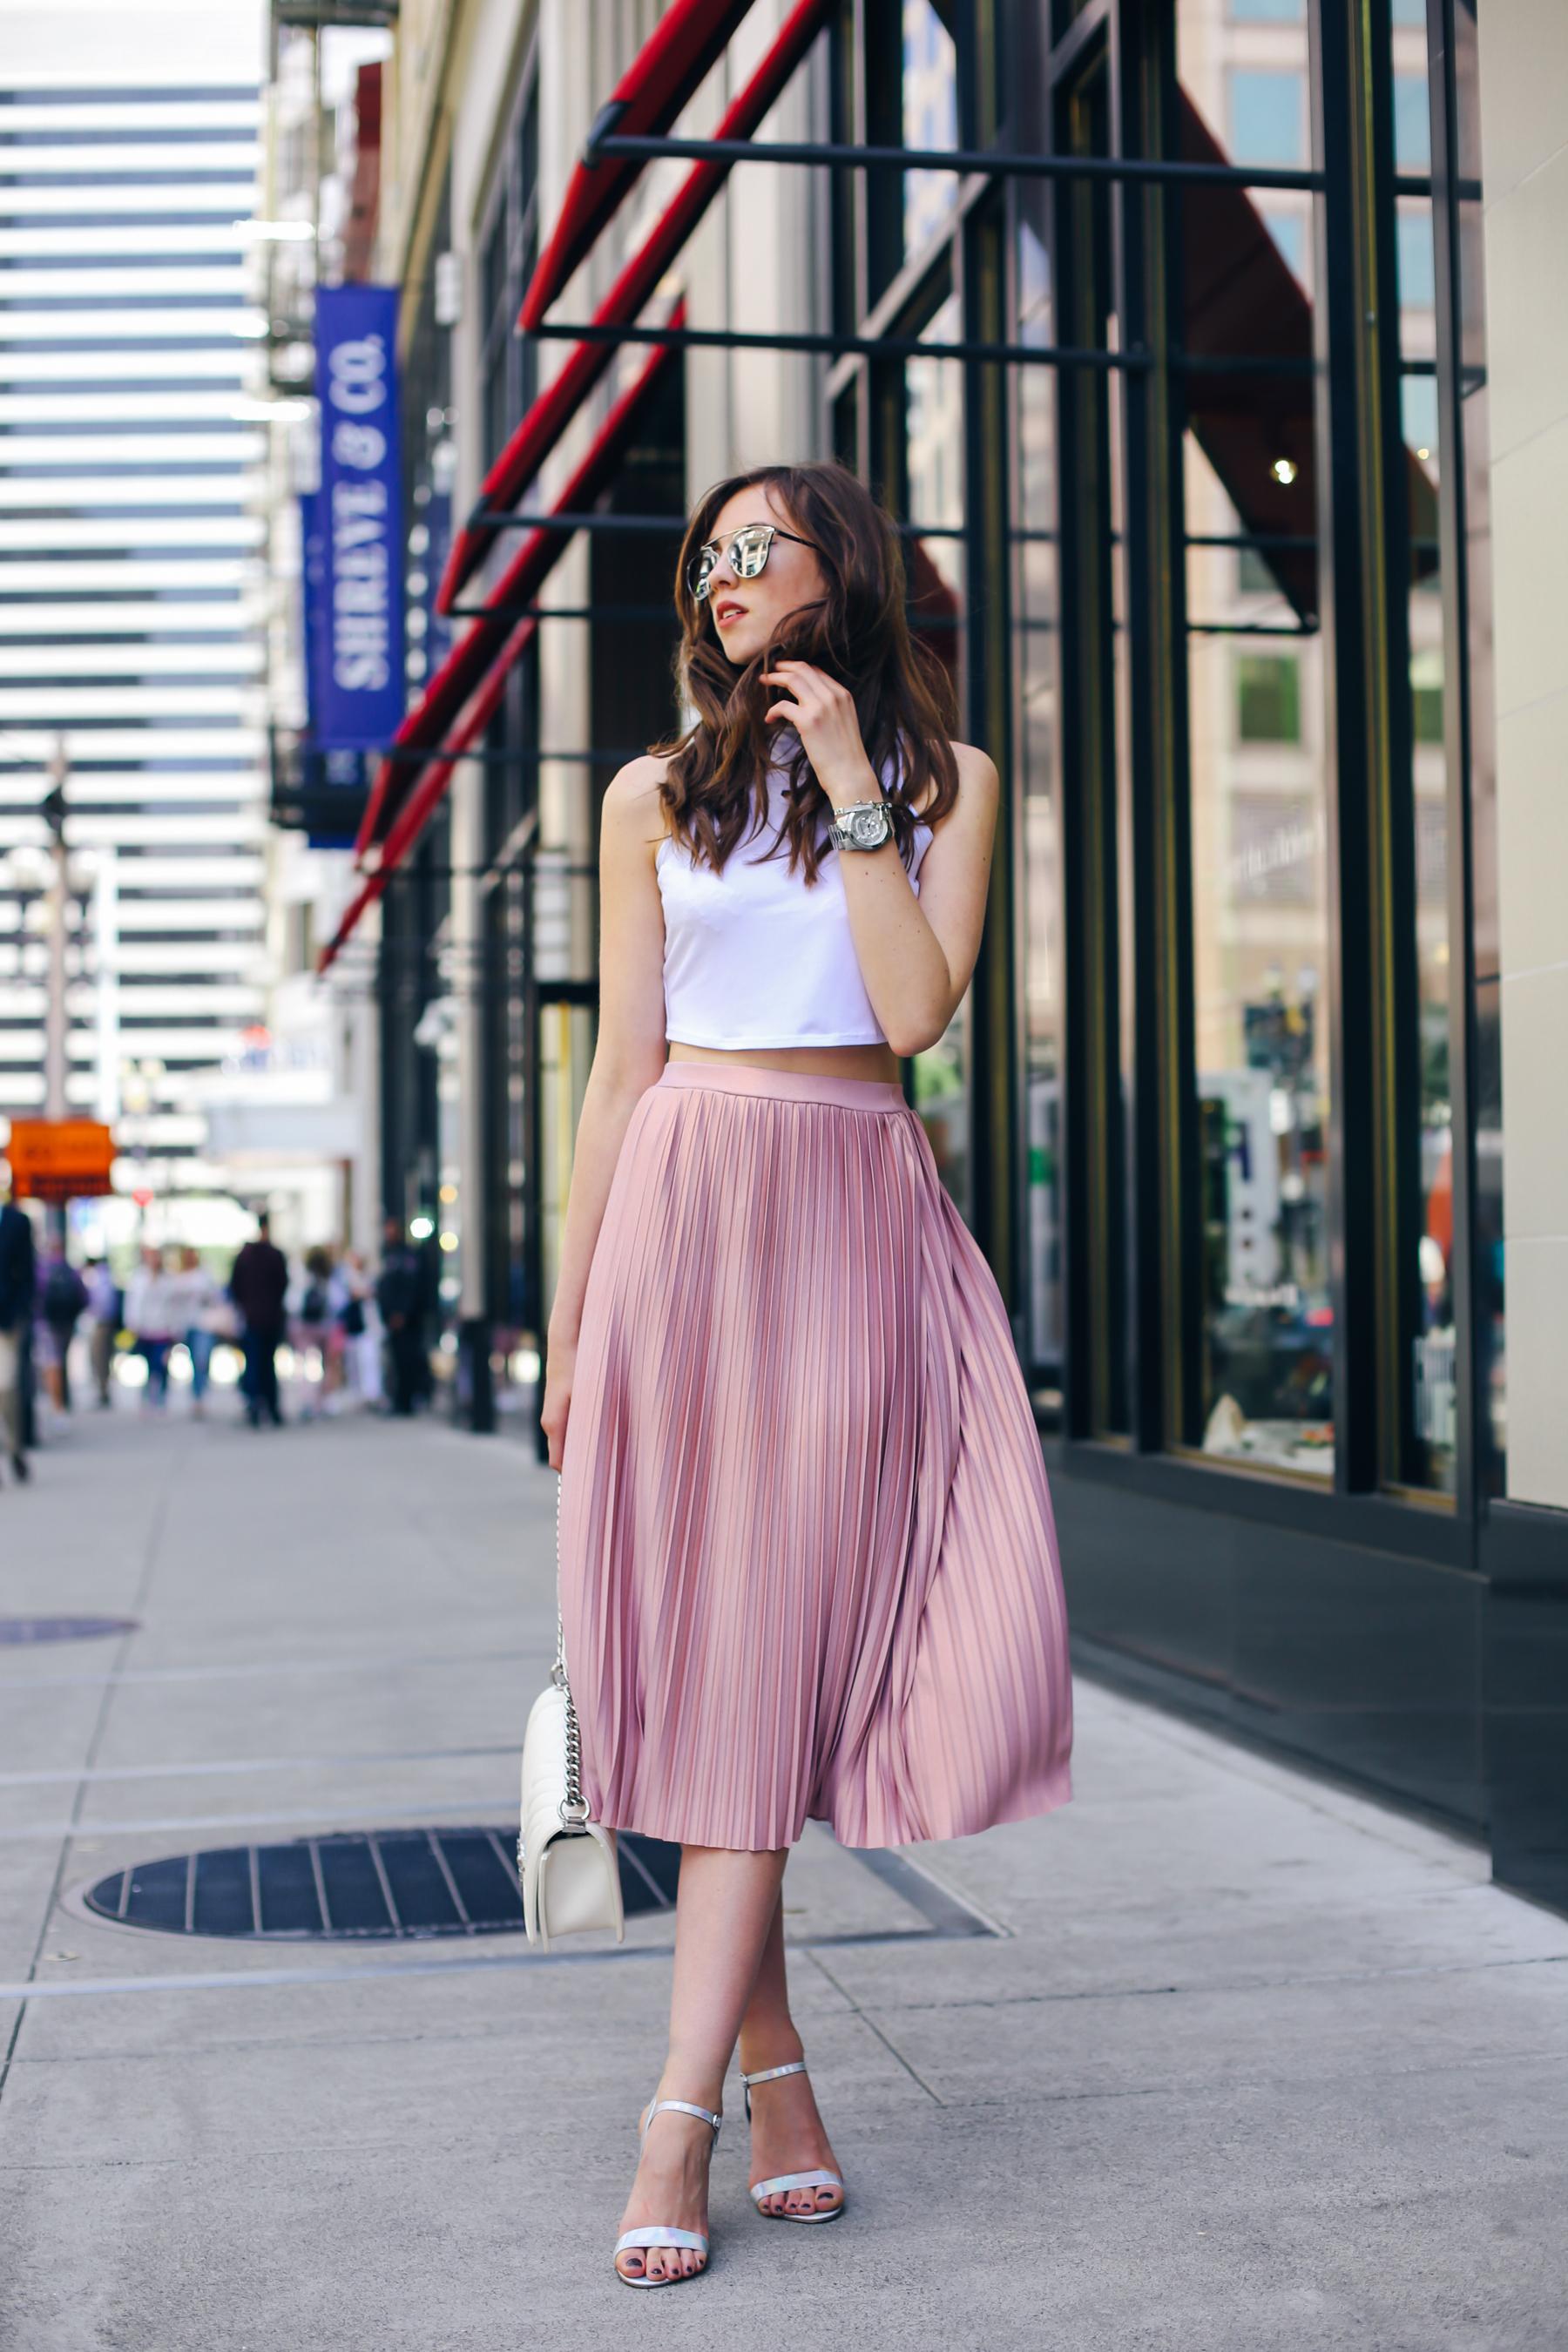 Barbora-Ondracova-FashioninmySoul-Fashion-Blogger-Photography-RyanbyRyanChua-7452